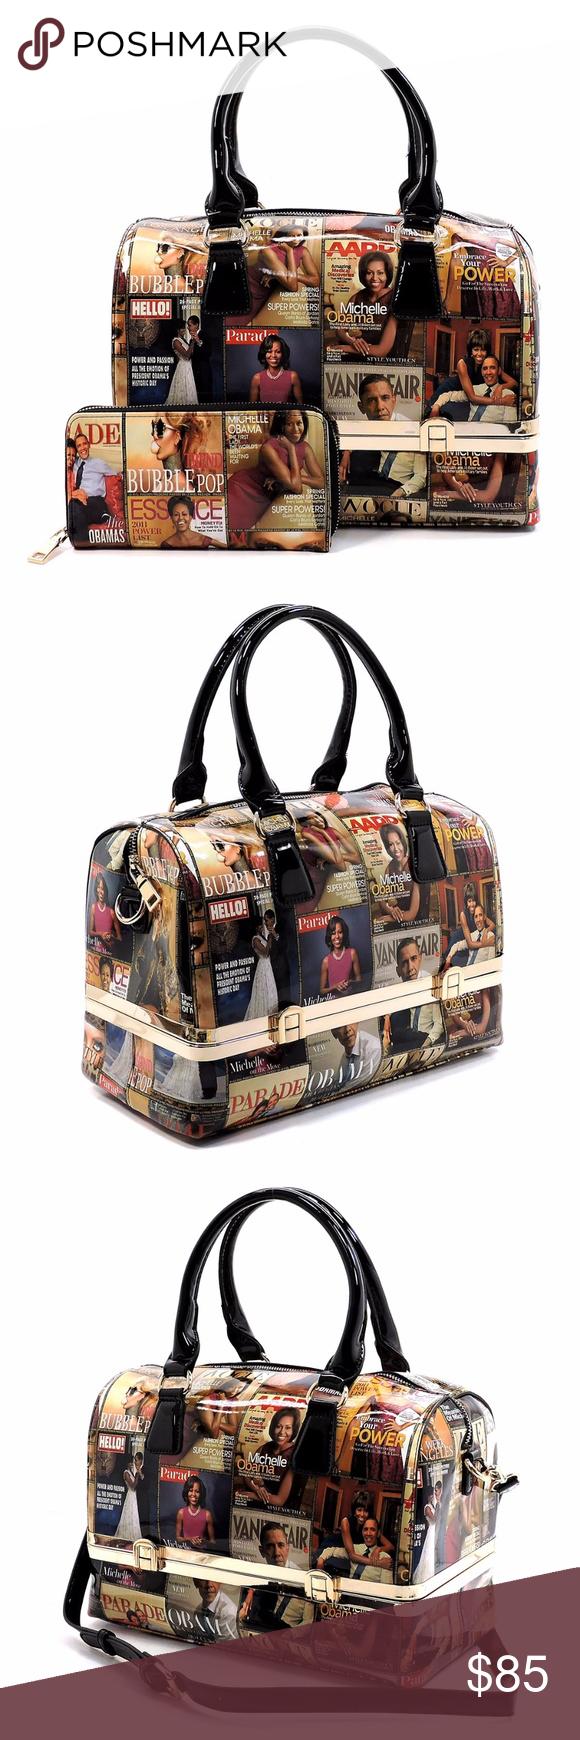 4e1efb87298c Michelle Obama Magazine Boston Bag/Wallet Set Designer inspired ...